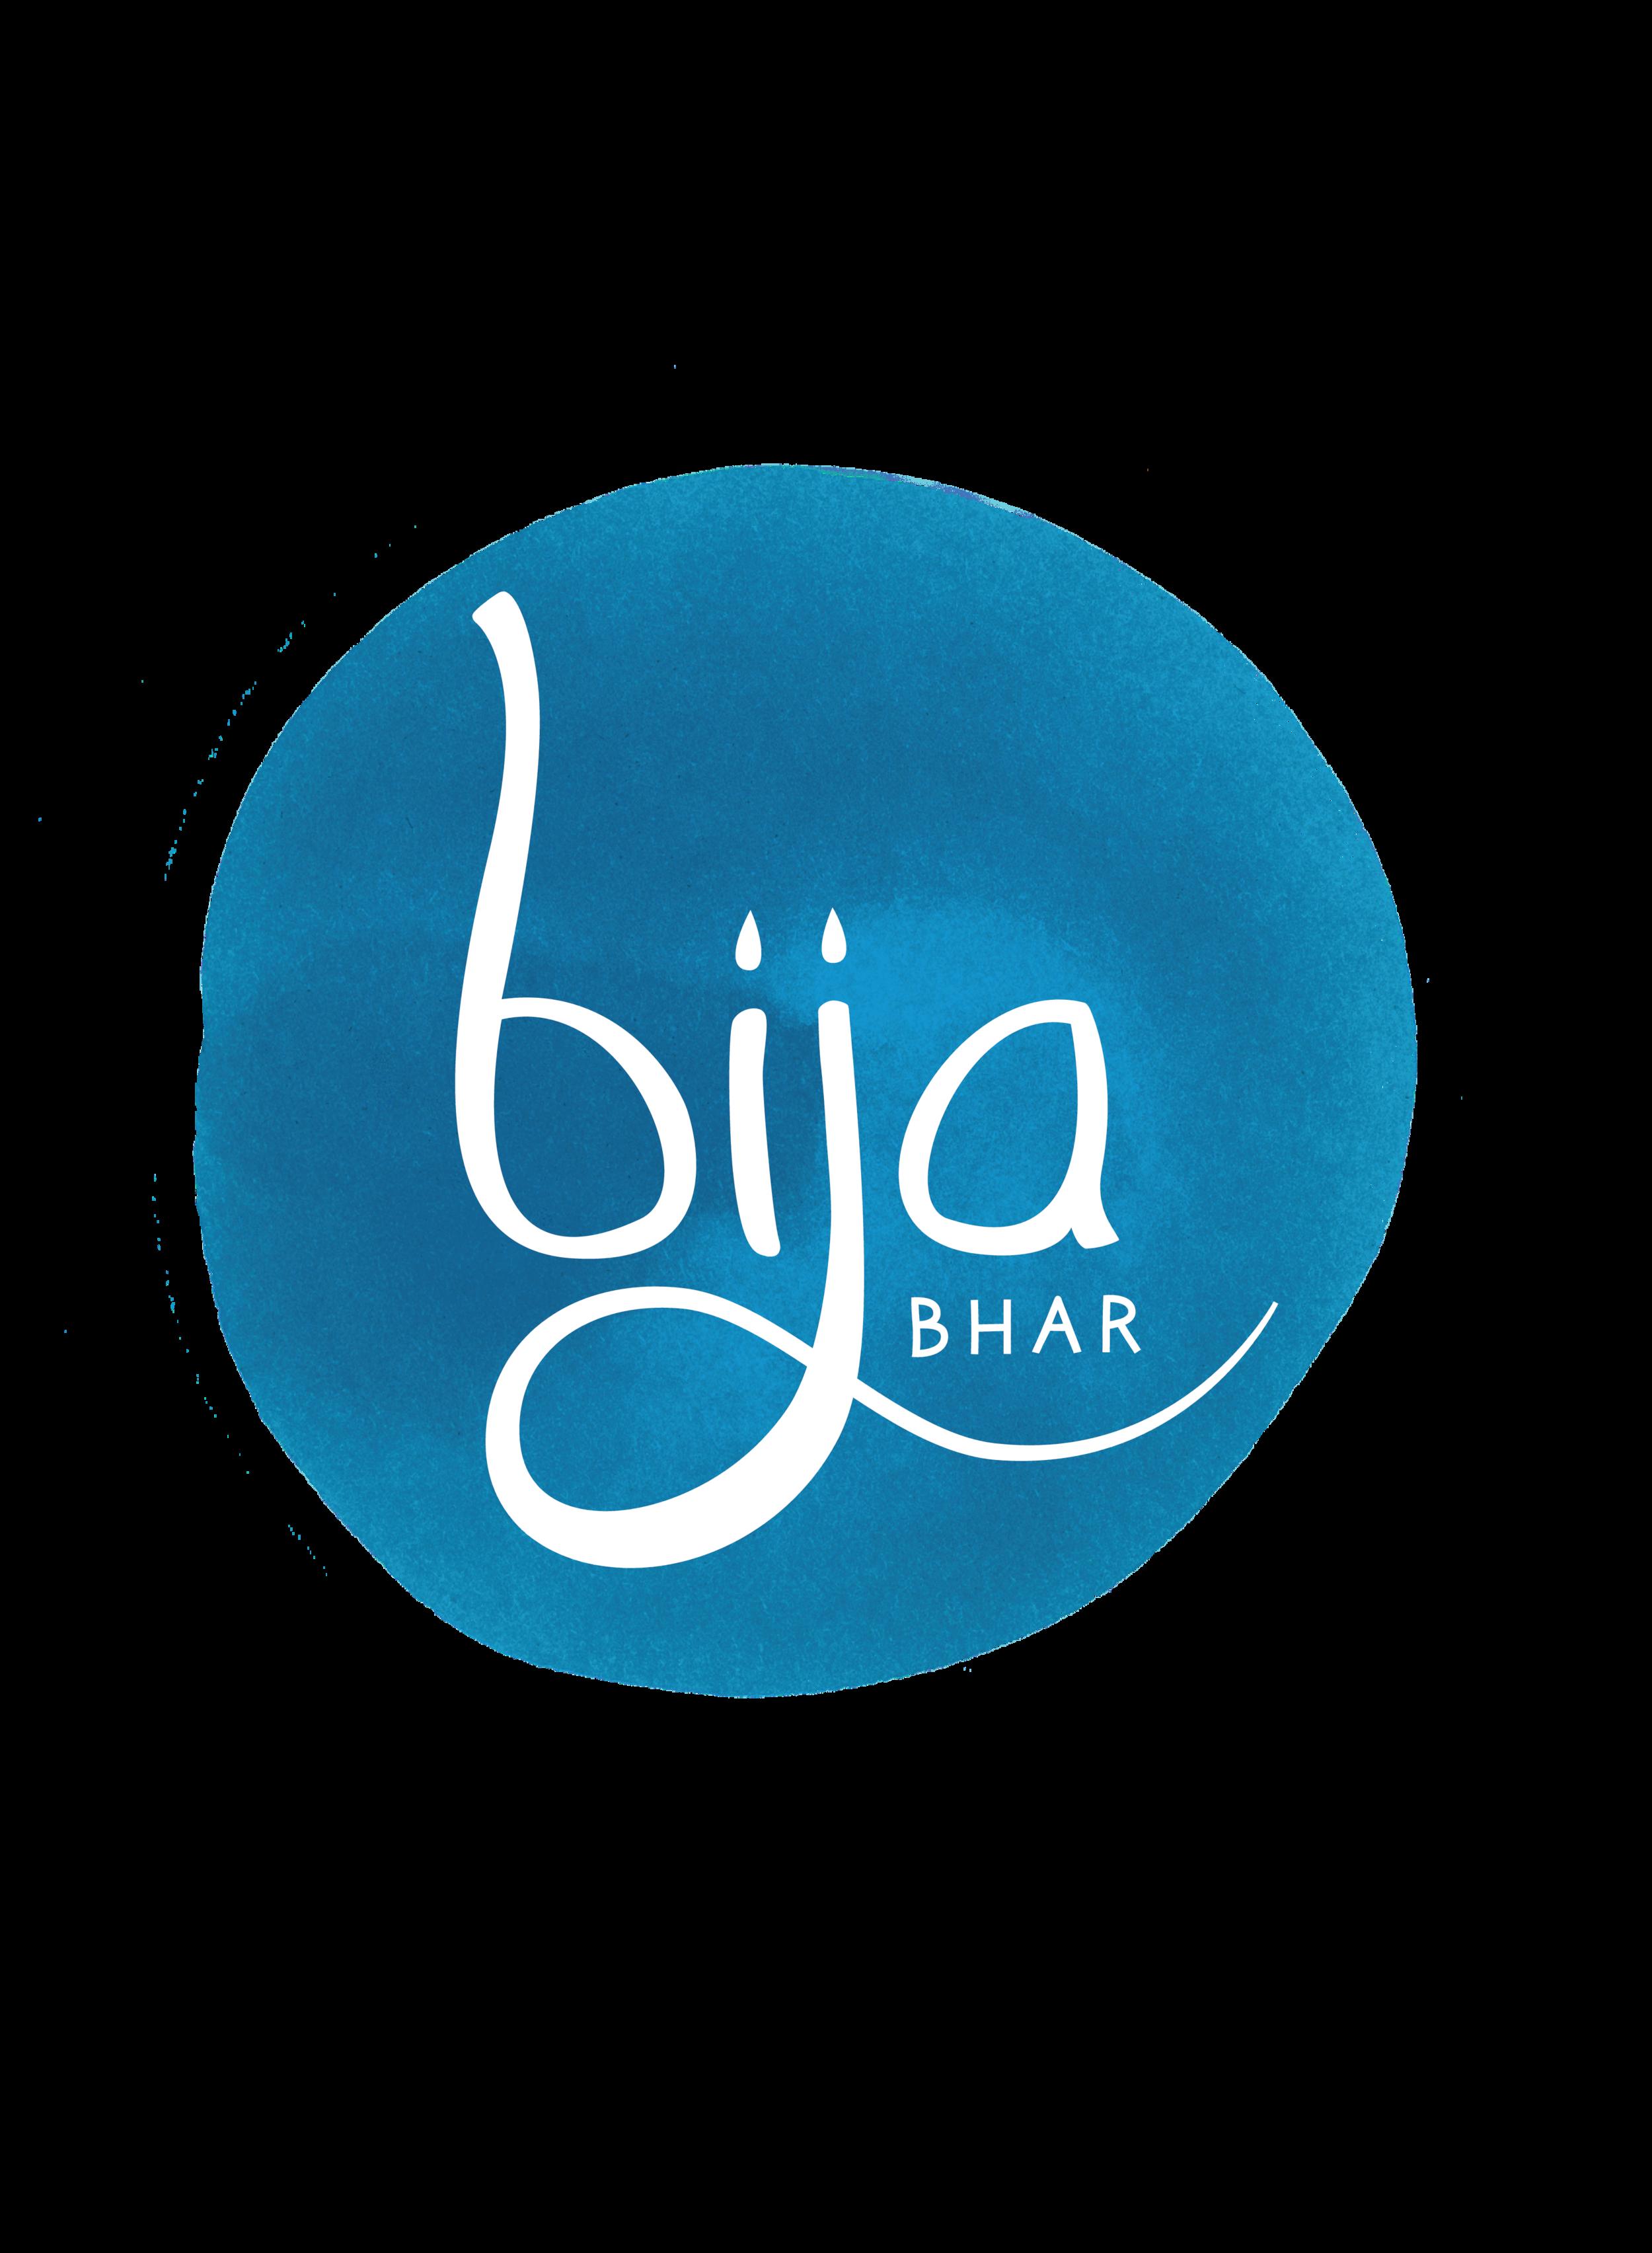 BIJA BHAR Brand, Packaging